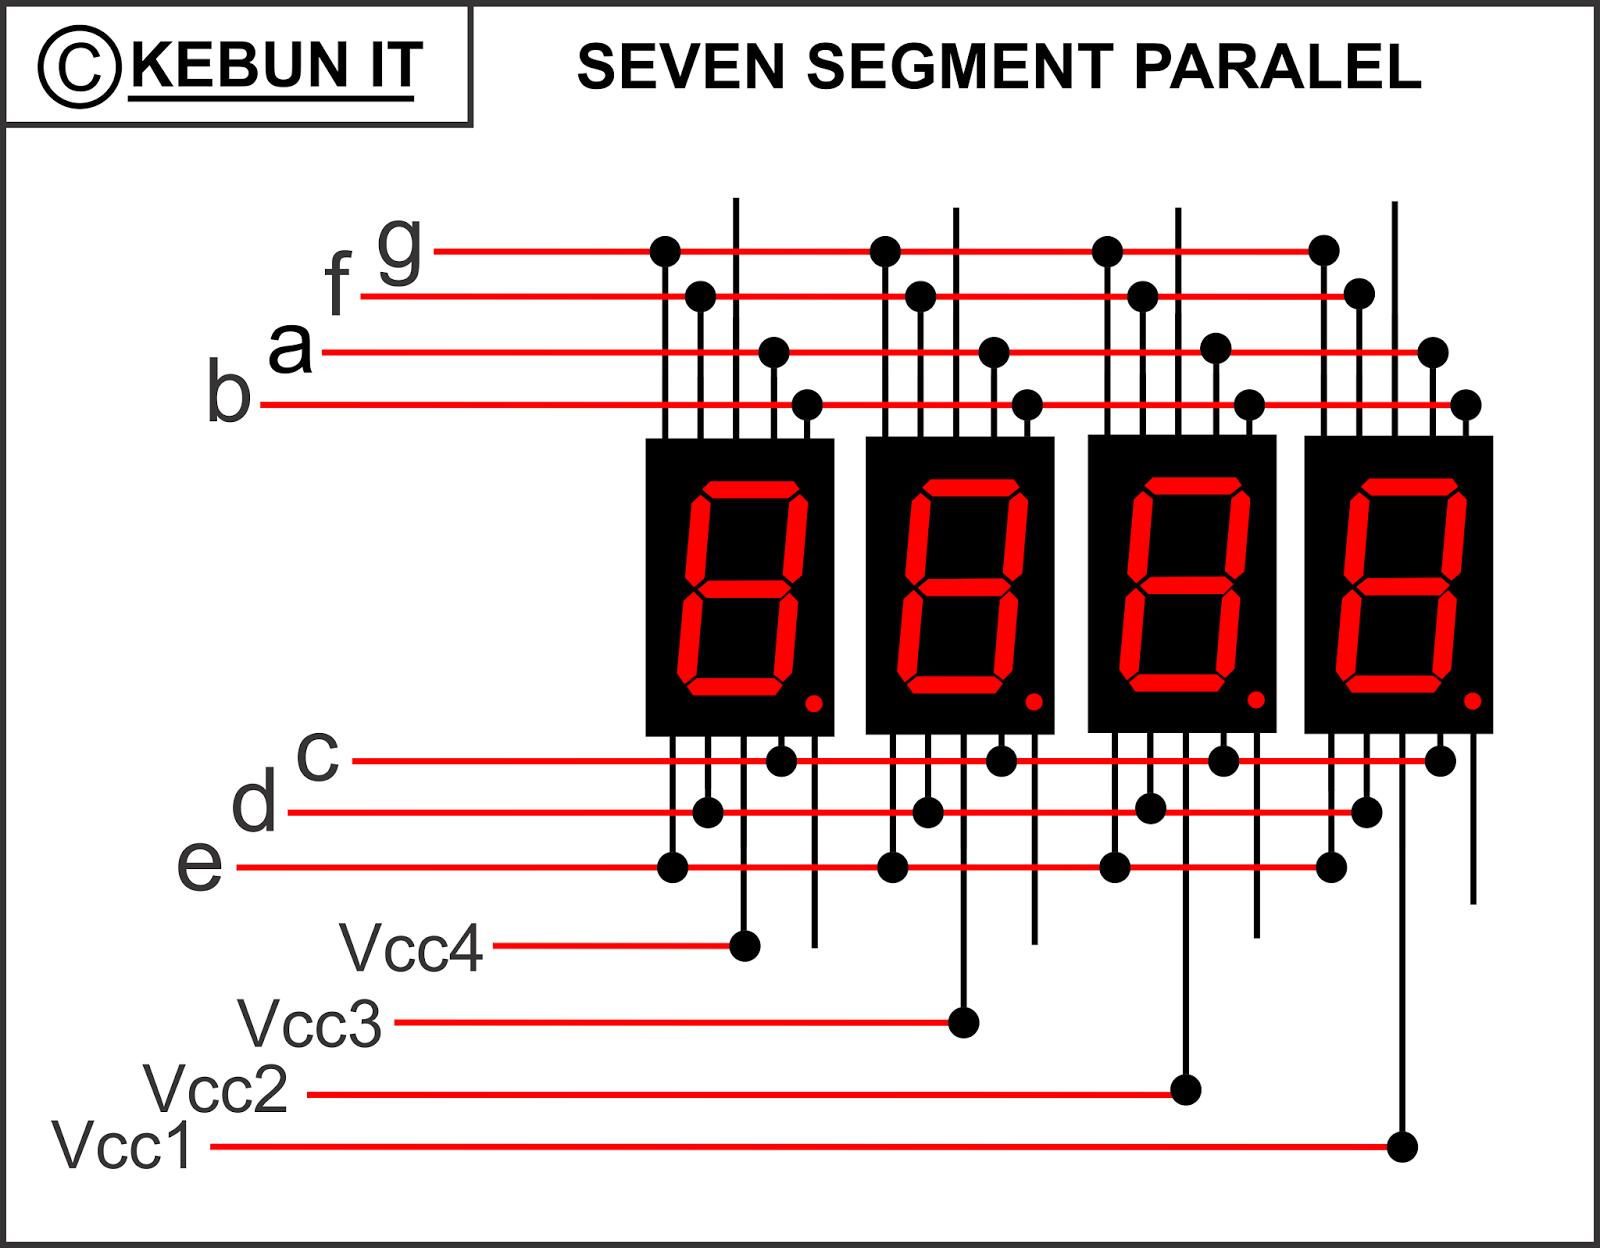 Kebun It Arduino 4 Seven Segment 1 Ic Shift Register Registers 74ls164 Berikut Rangkaian Paralel